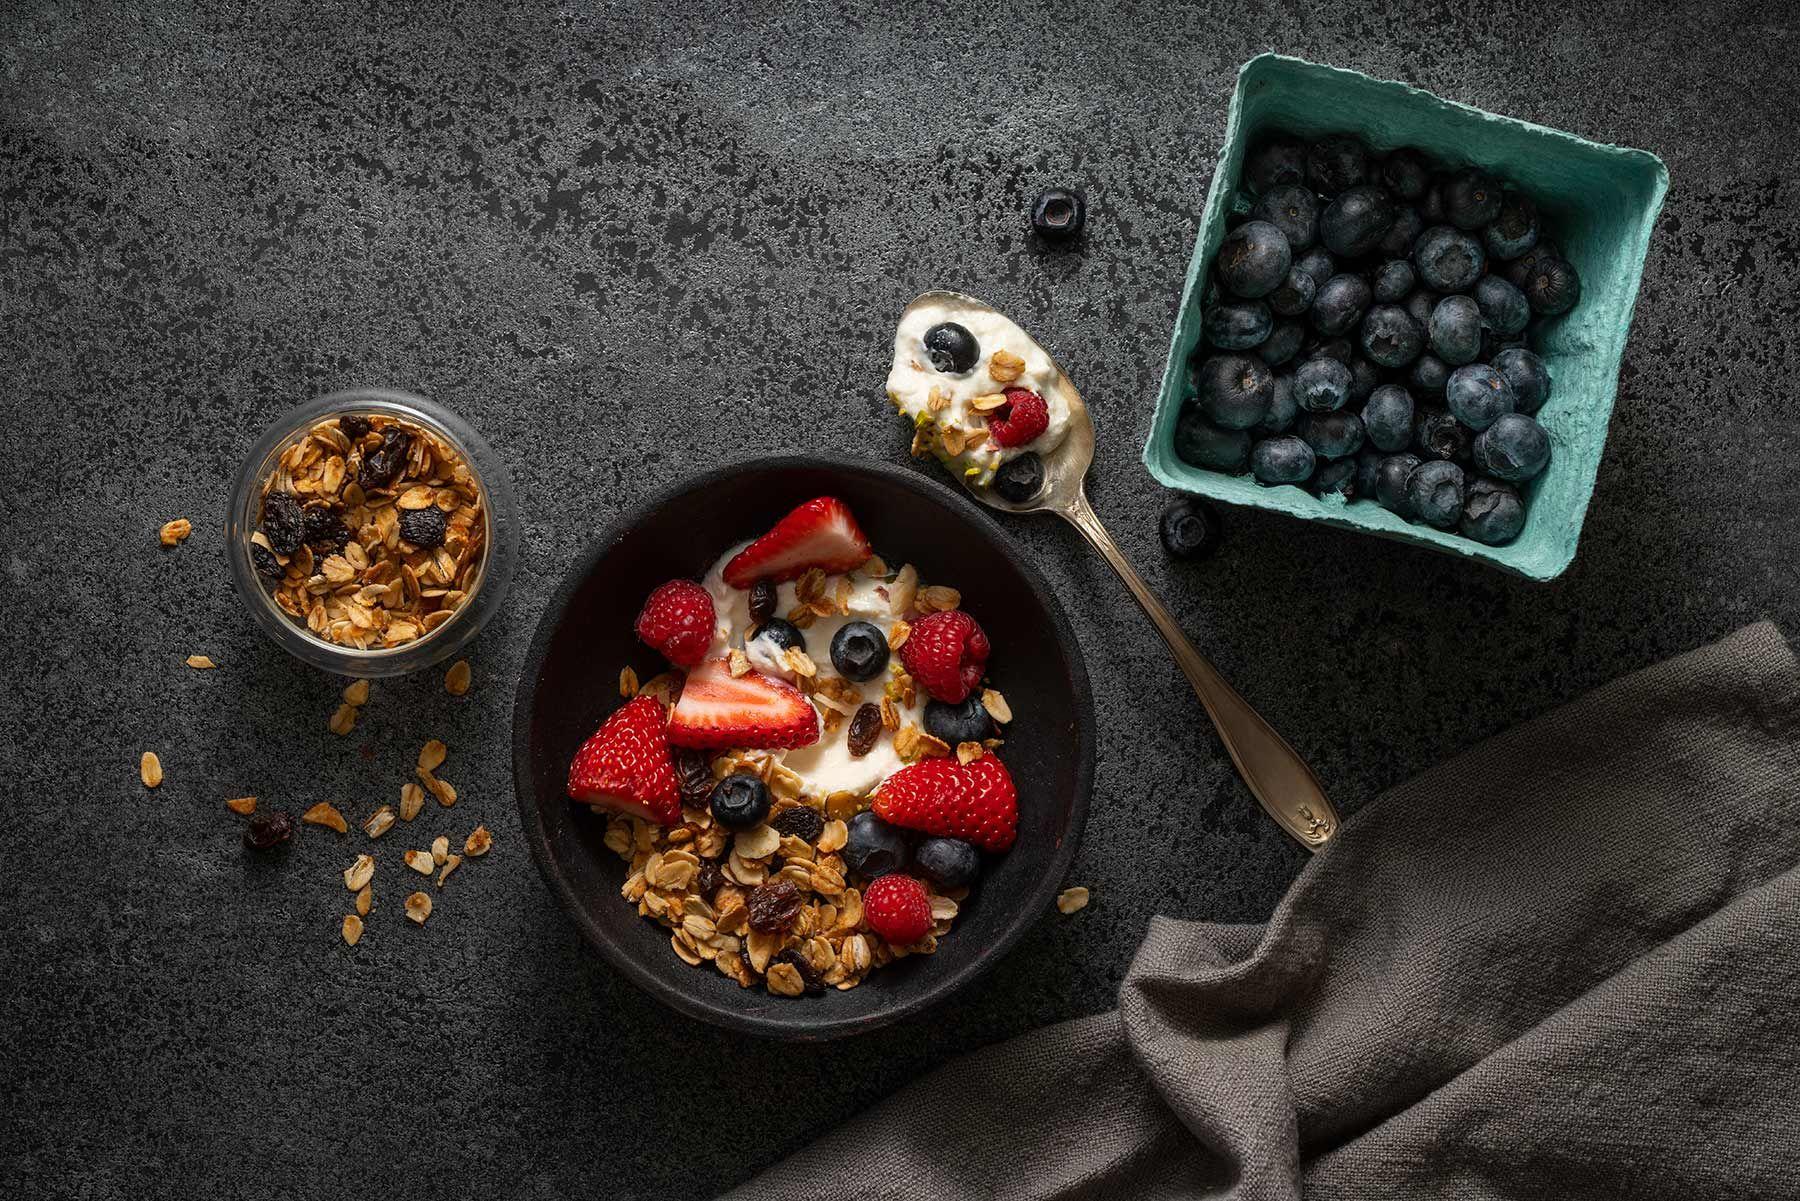 grainolayogurtberries.jpg